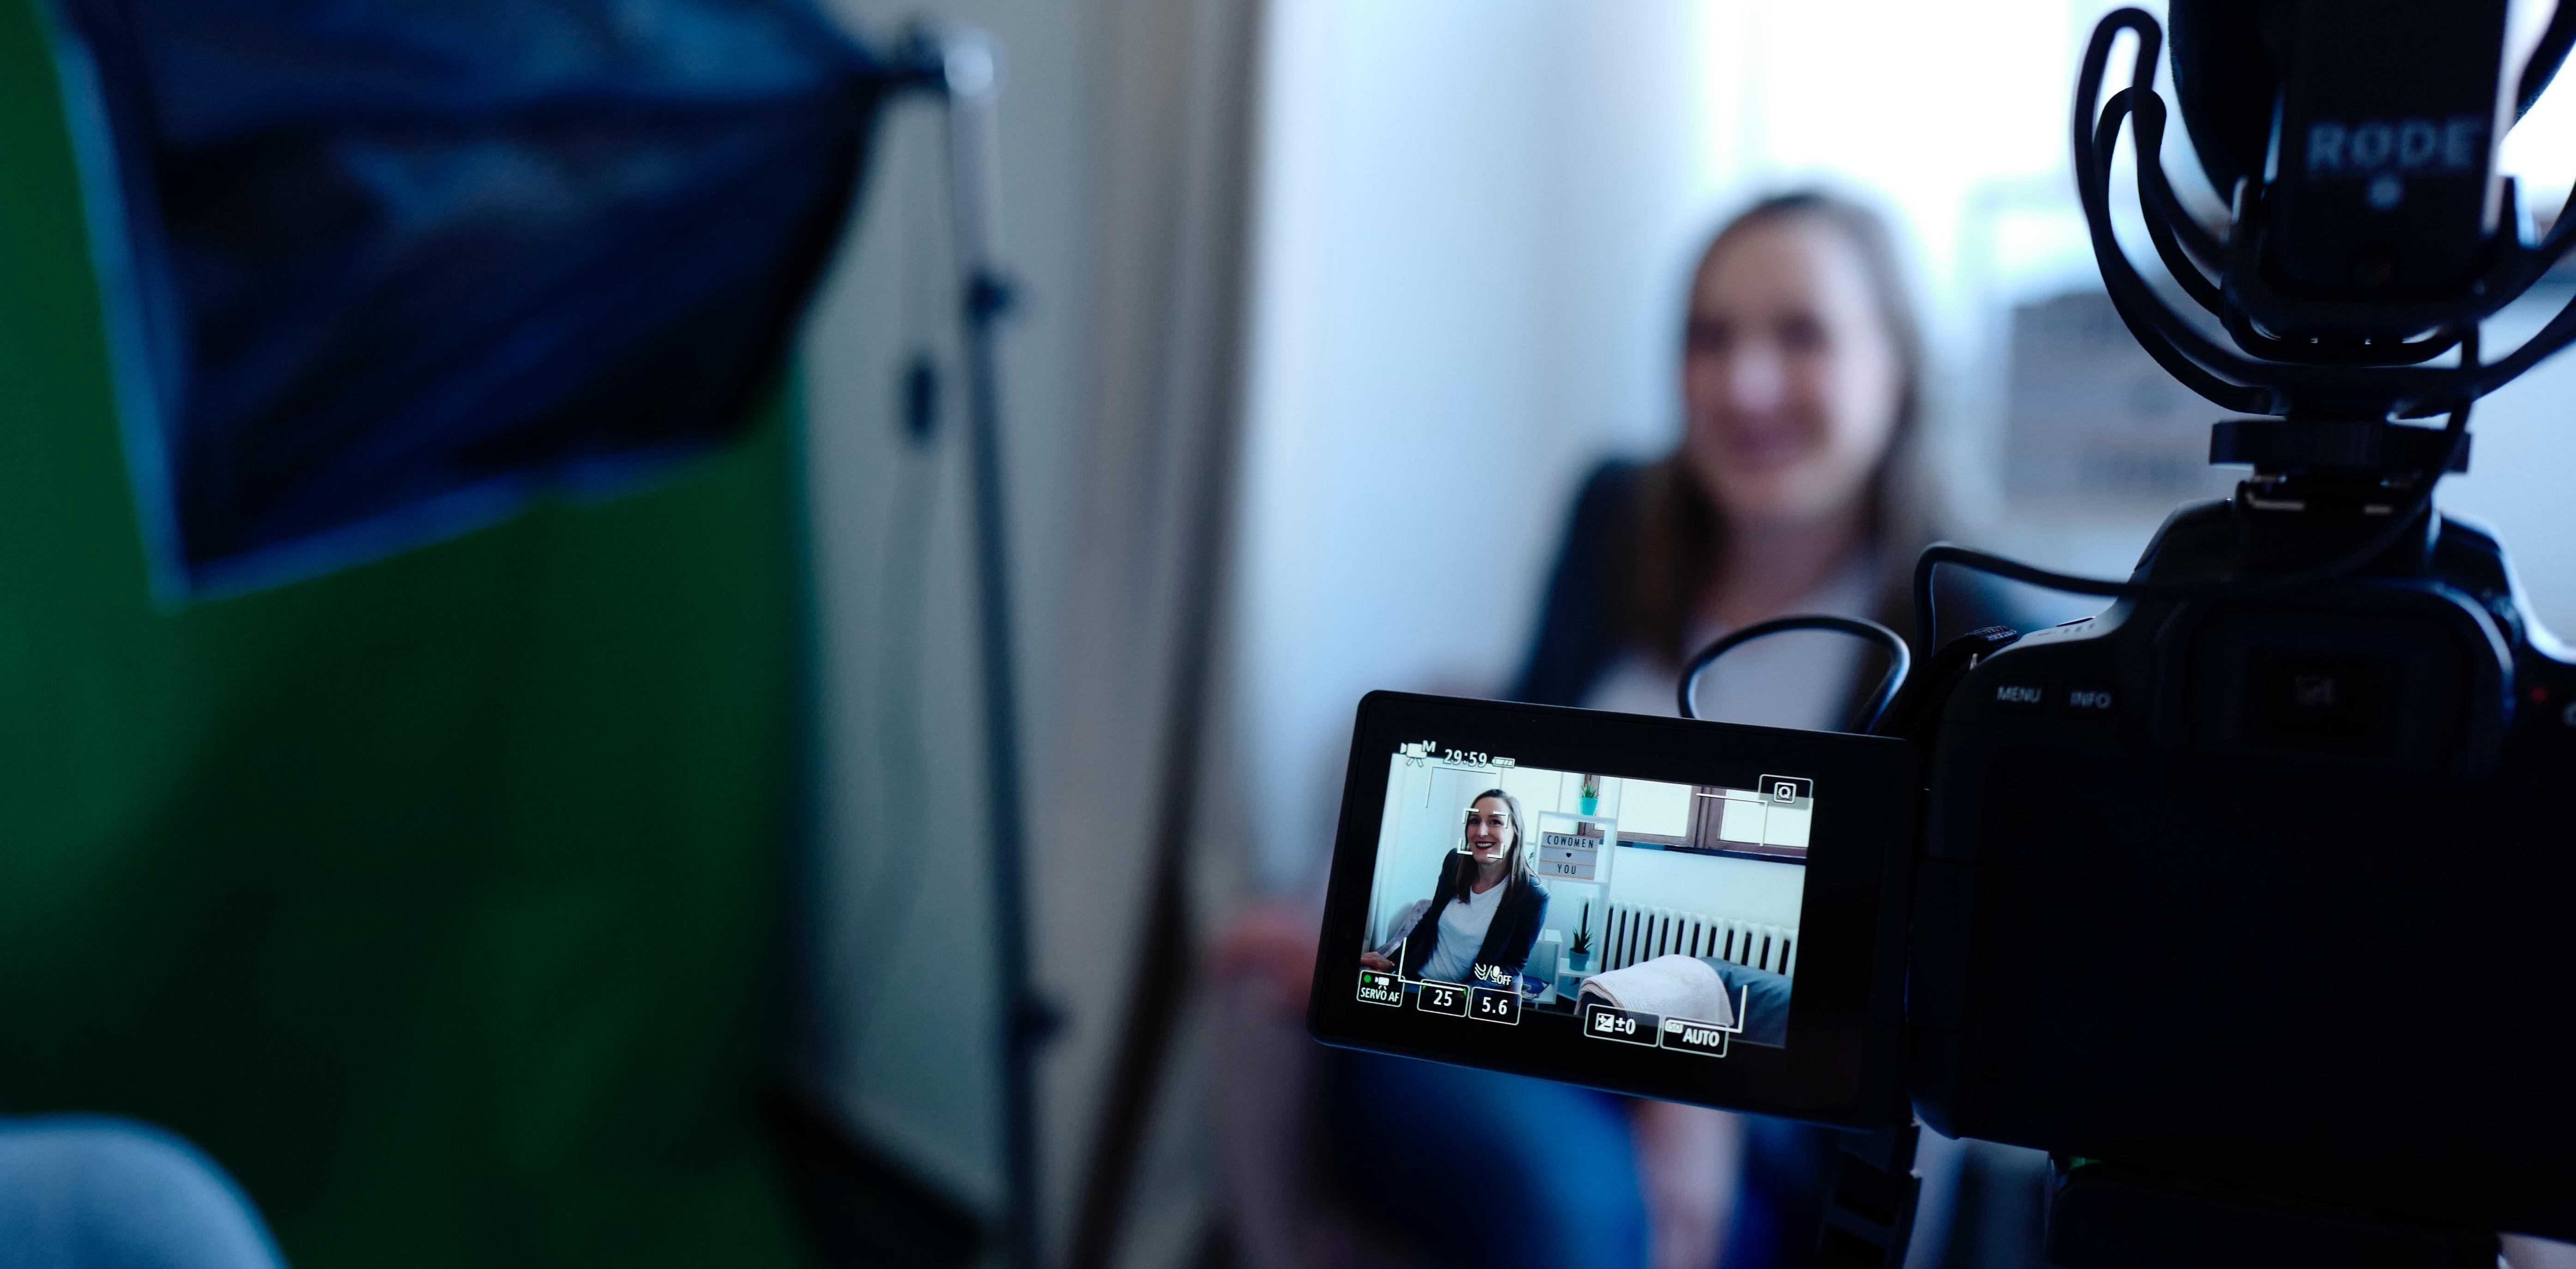 Video camera focusing on woman